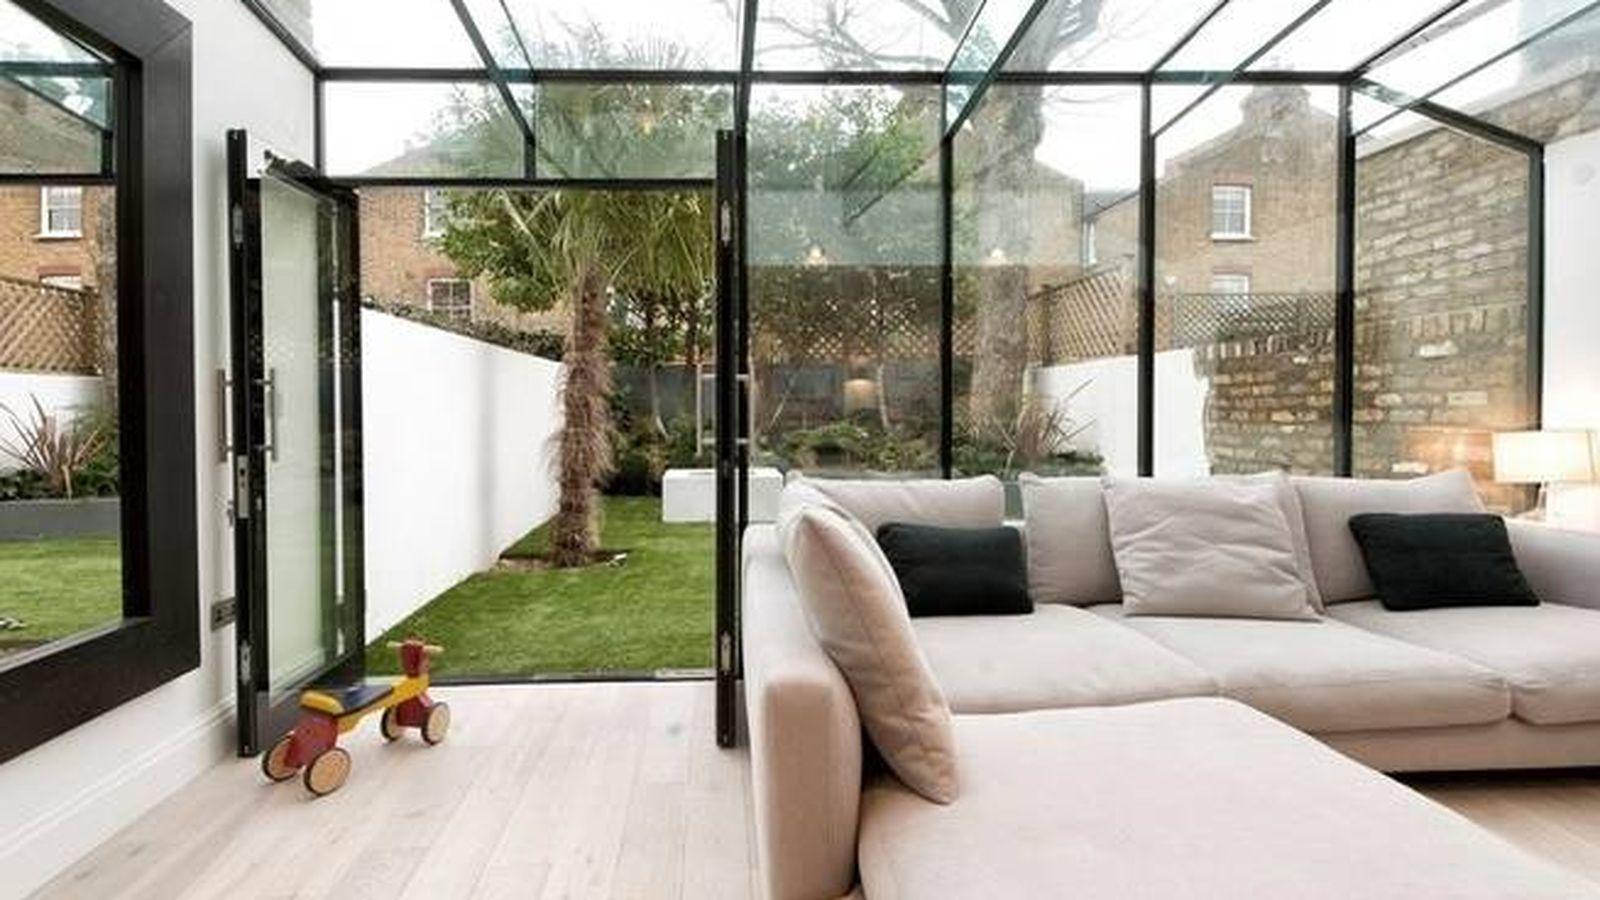 Decoraci n cerramiento de terraza o un patio exterior - Terrazas interiores decoracion ...